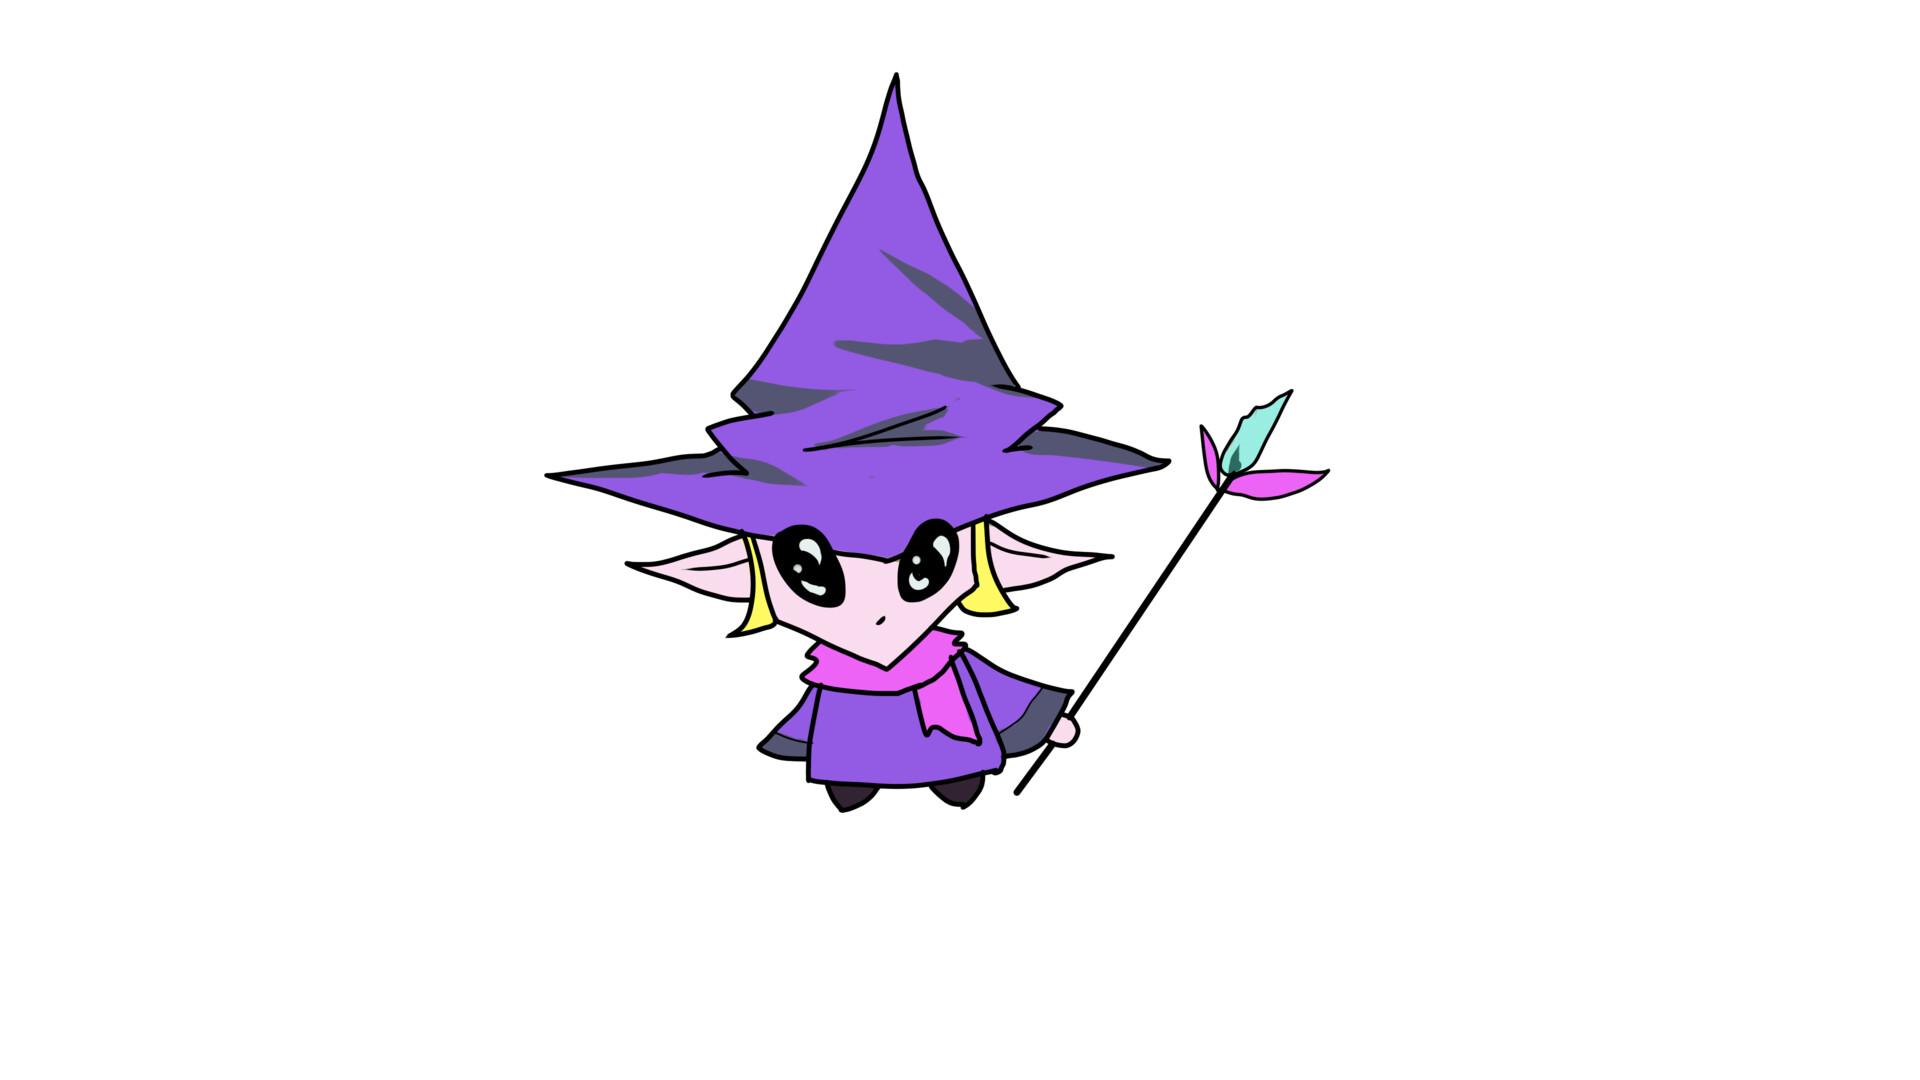 Main character sprite